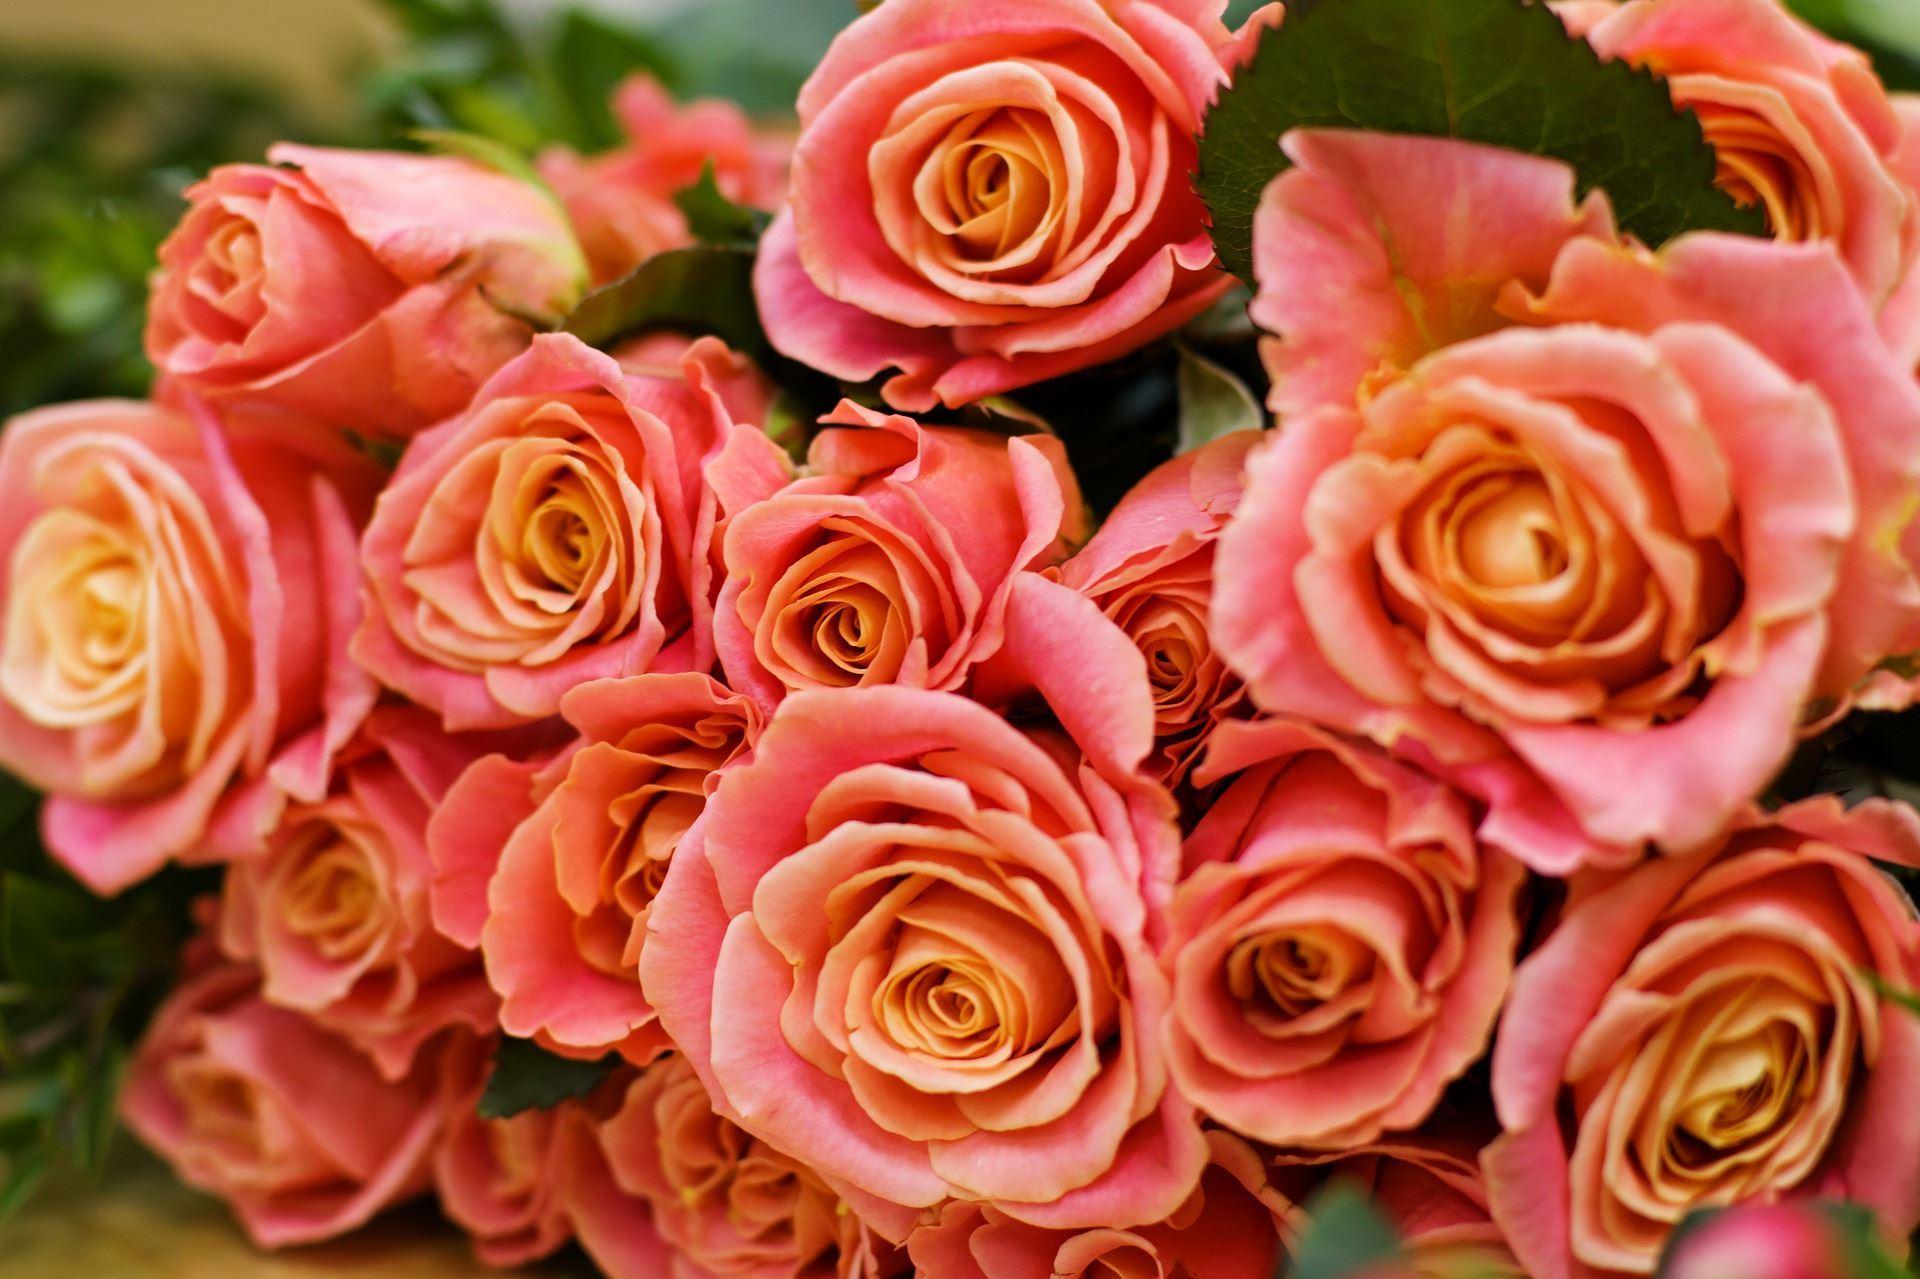 Verda's Flowers & Gifts